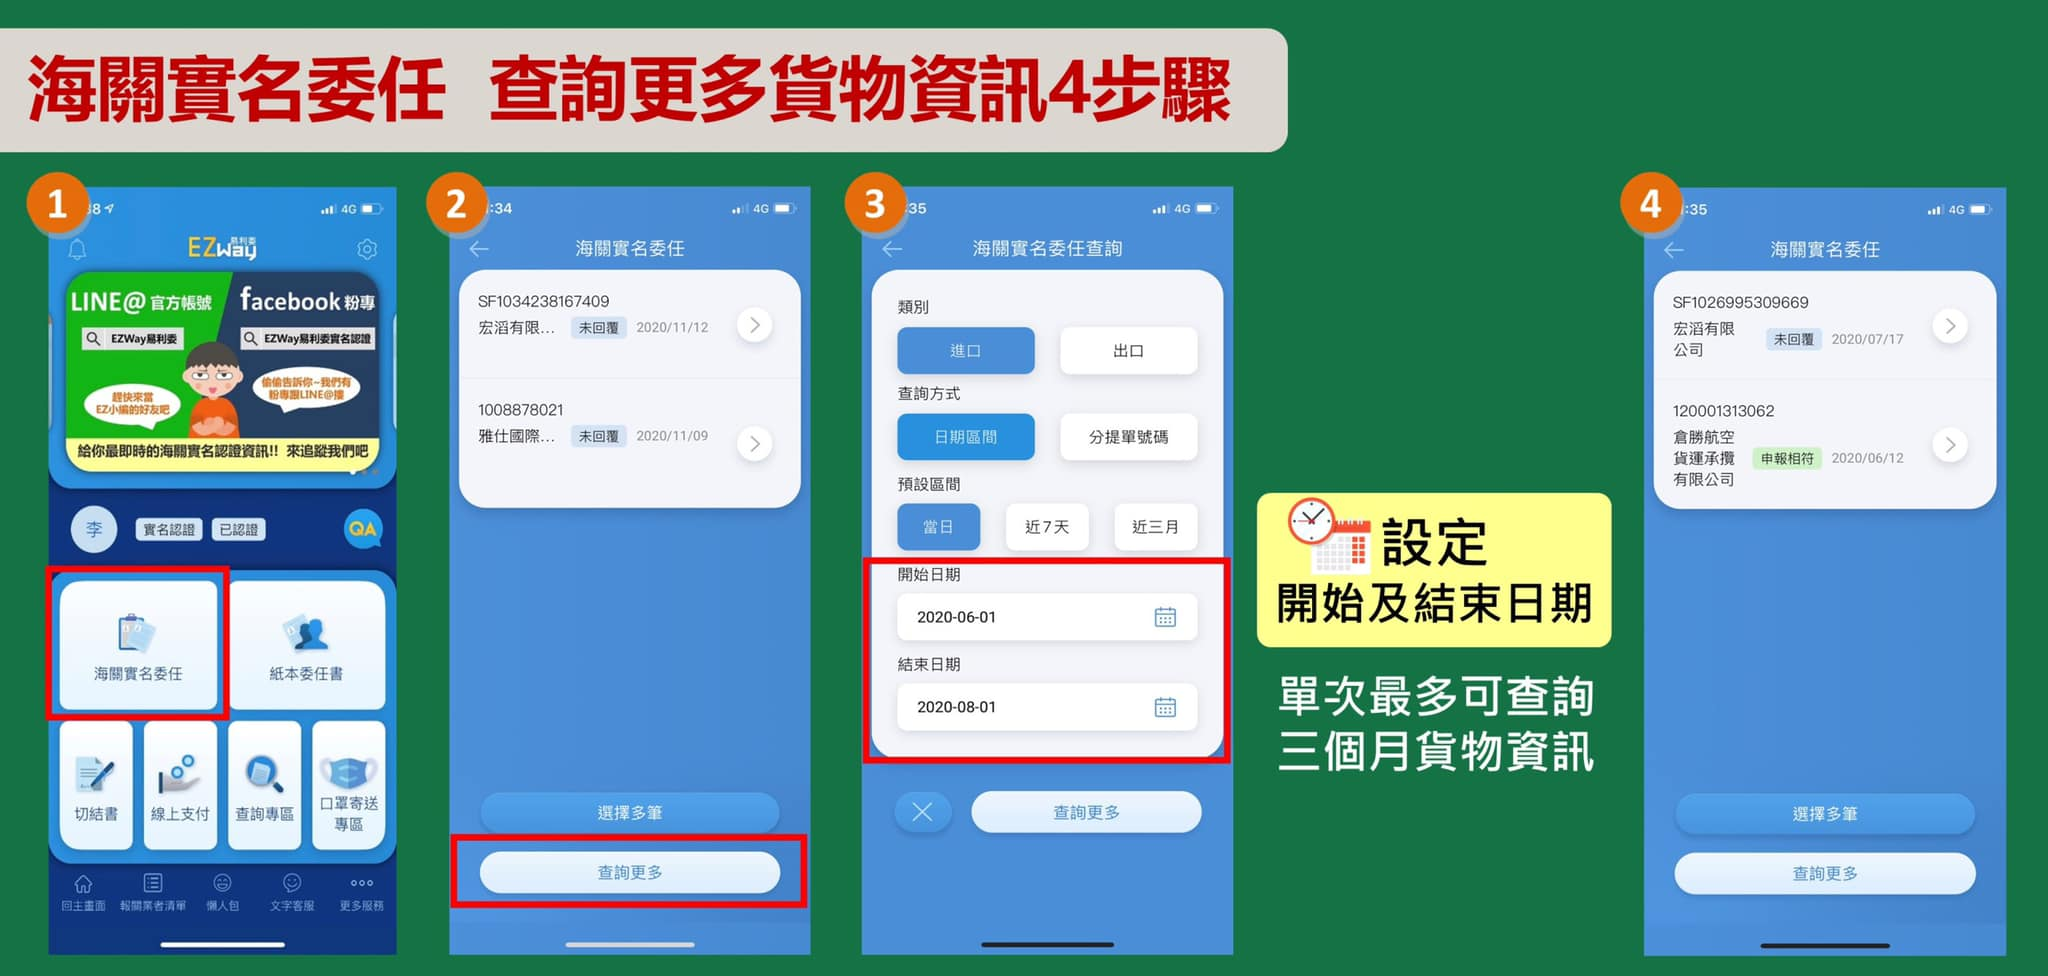 【EZ Way教學】1分鐘搞懂台灣報關稅軟體手機APP-易利委|快遞收貨人實名認證 @GINA環球旅行生活